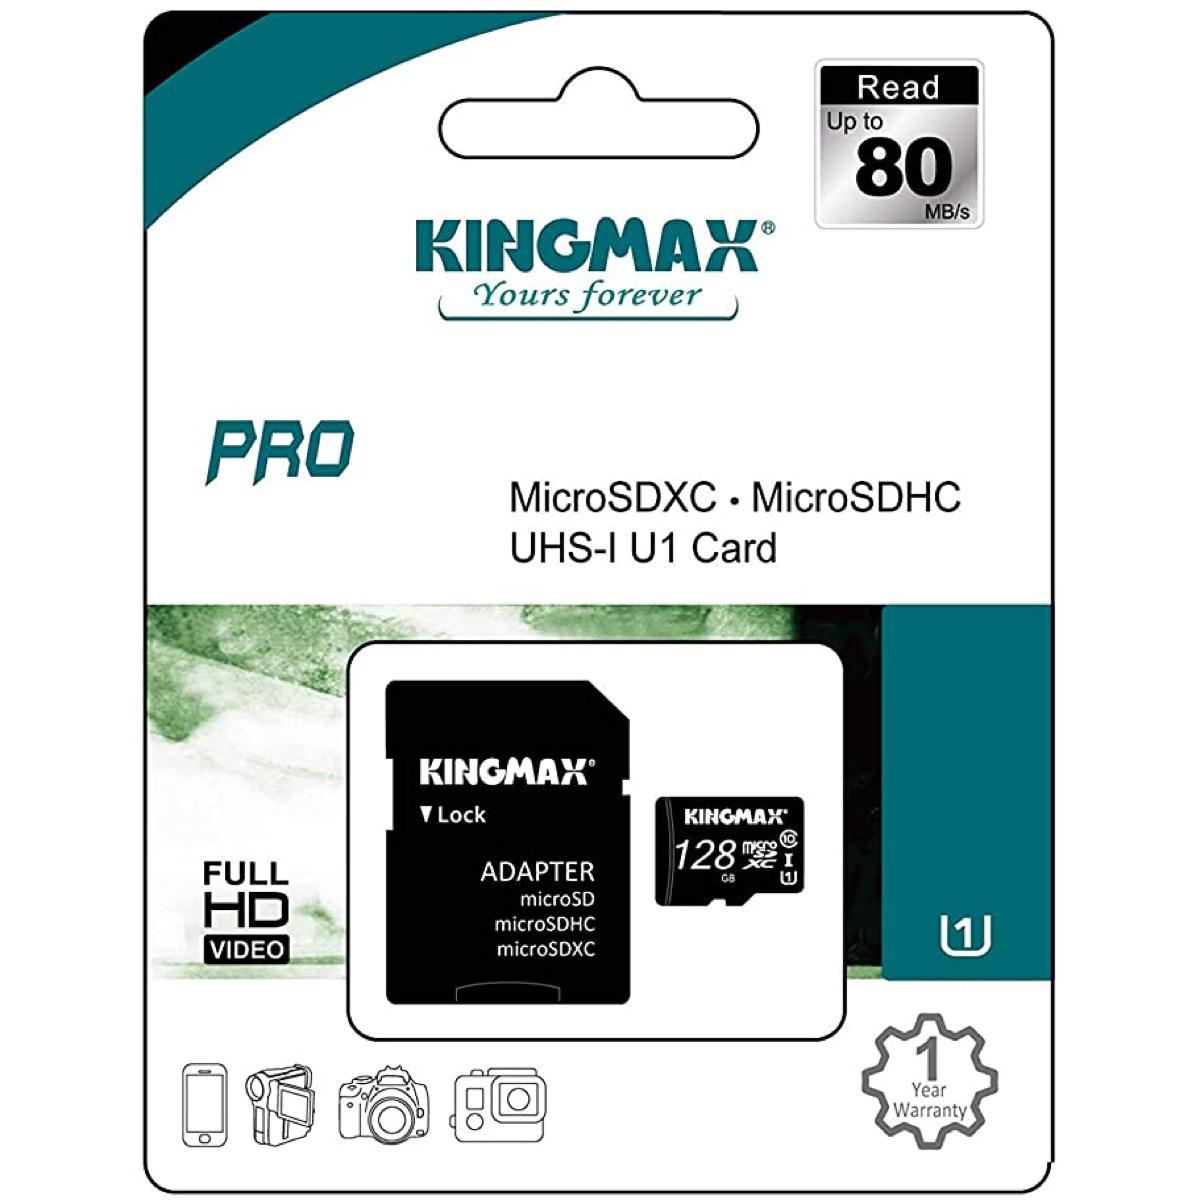 UHS-I マート 高速転送 最大読出し80MB 秒 SD変換アダプター付属 KINGMAX PRO microSDXCカード 128GB Class10 SD変換アダプタ付属 U1 マイクロSD 1年保証 キングマックス KM128GMCSDUHSP1A-1 KM 全国送料無料 国内正規品 卓出 1C micro